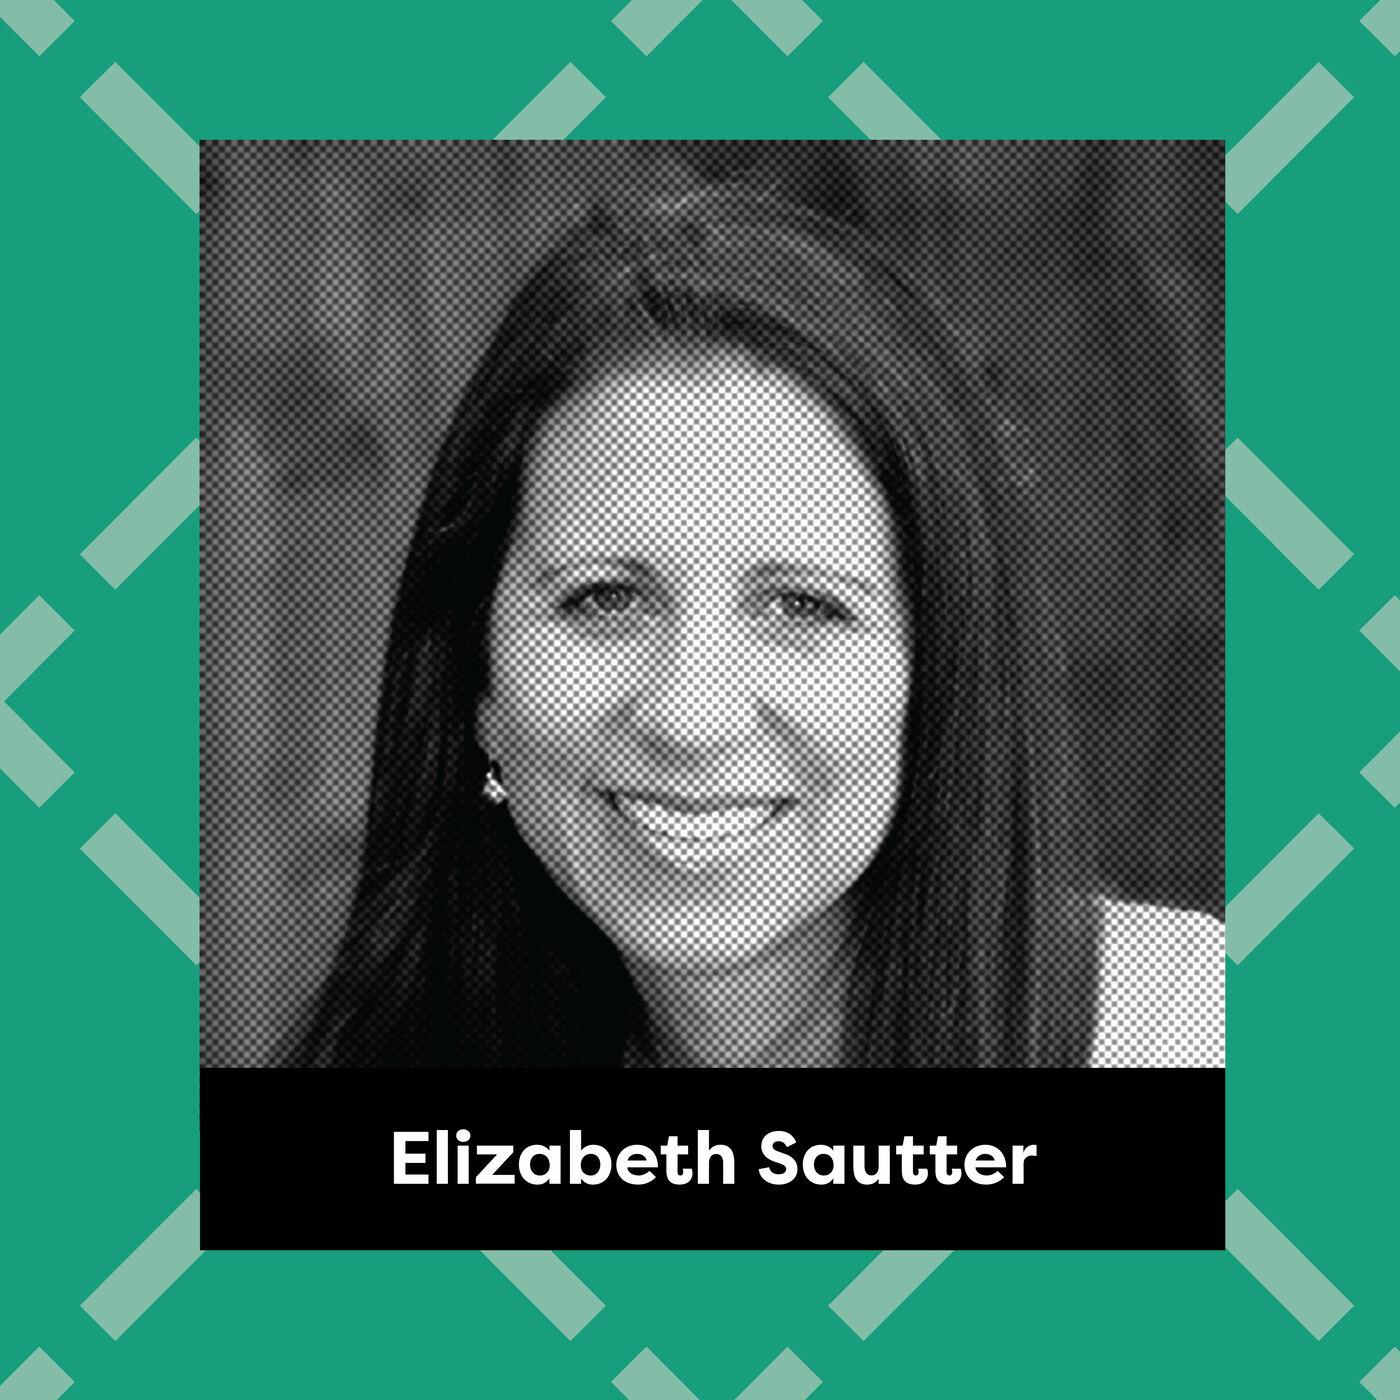 Ep. 139: Elizabeth Sautter MA, CCC-SLP - Know Thy 'Emotional' Self